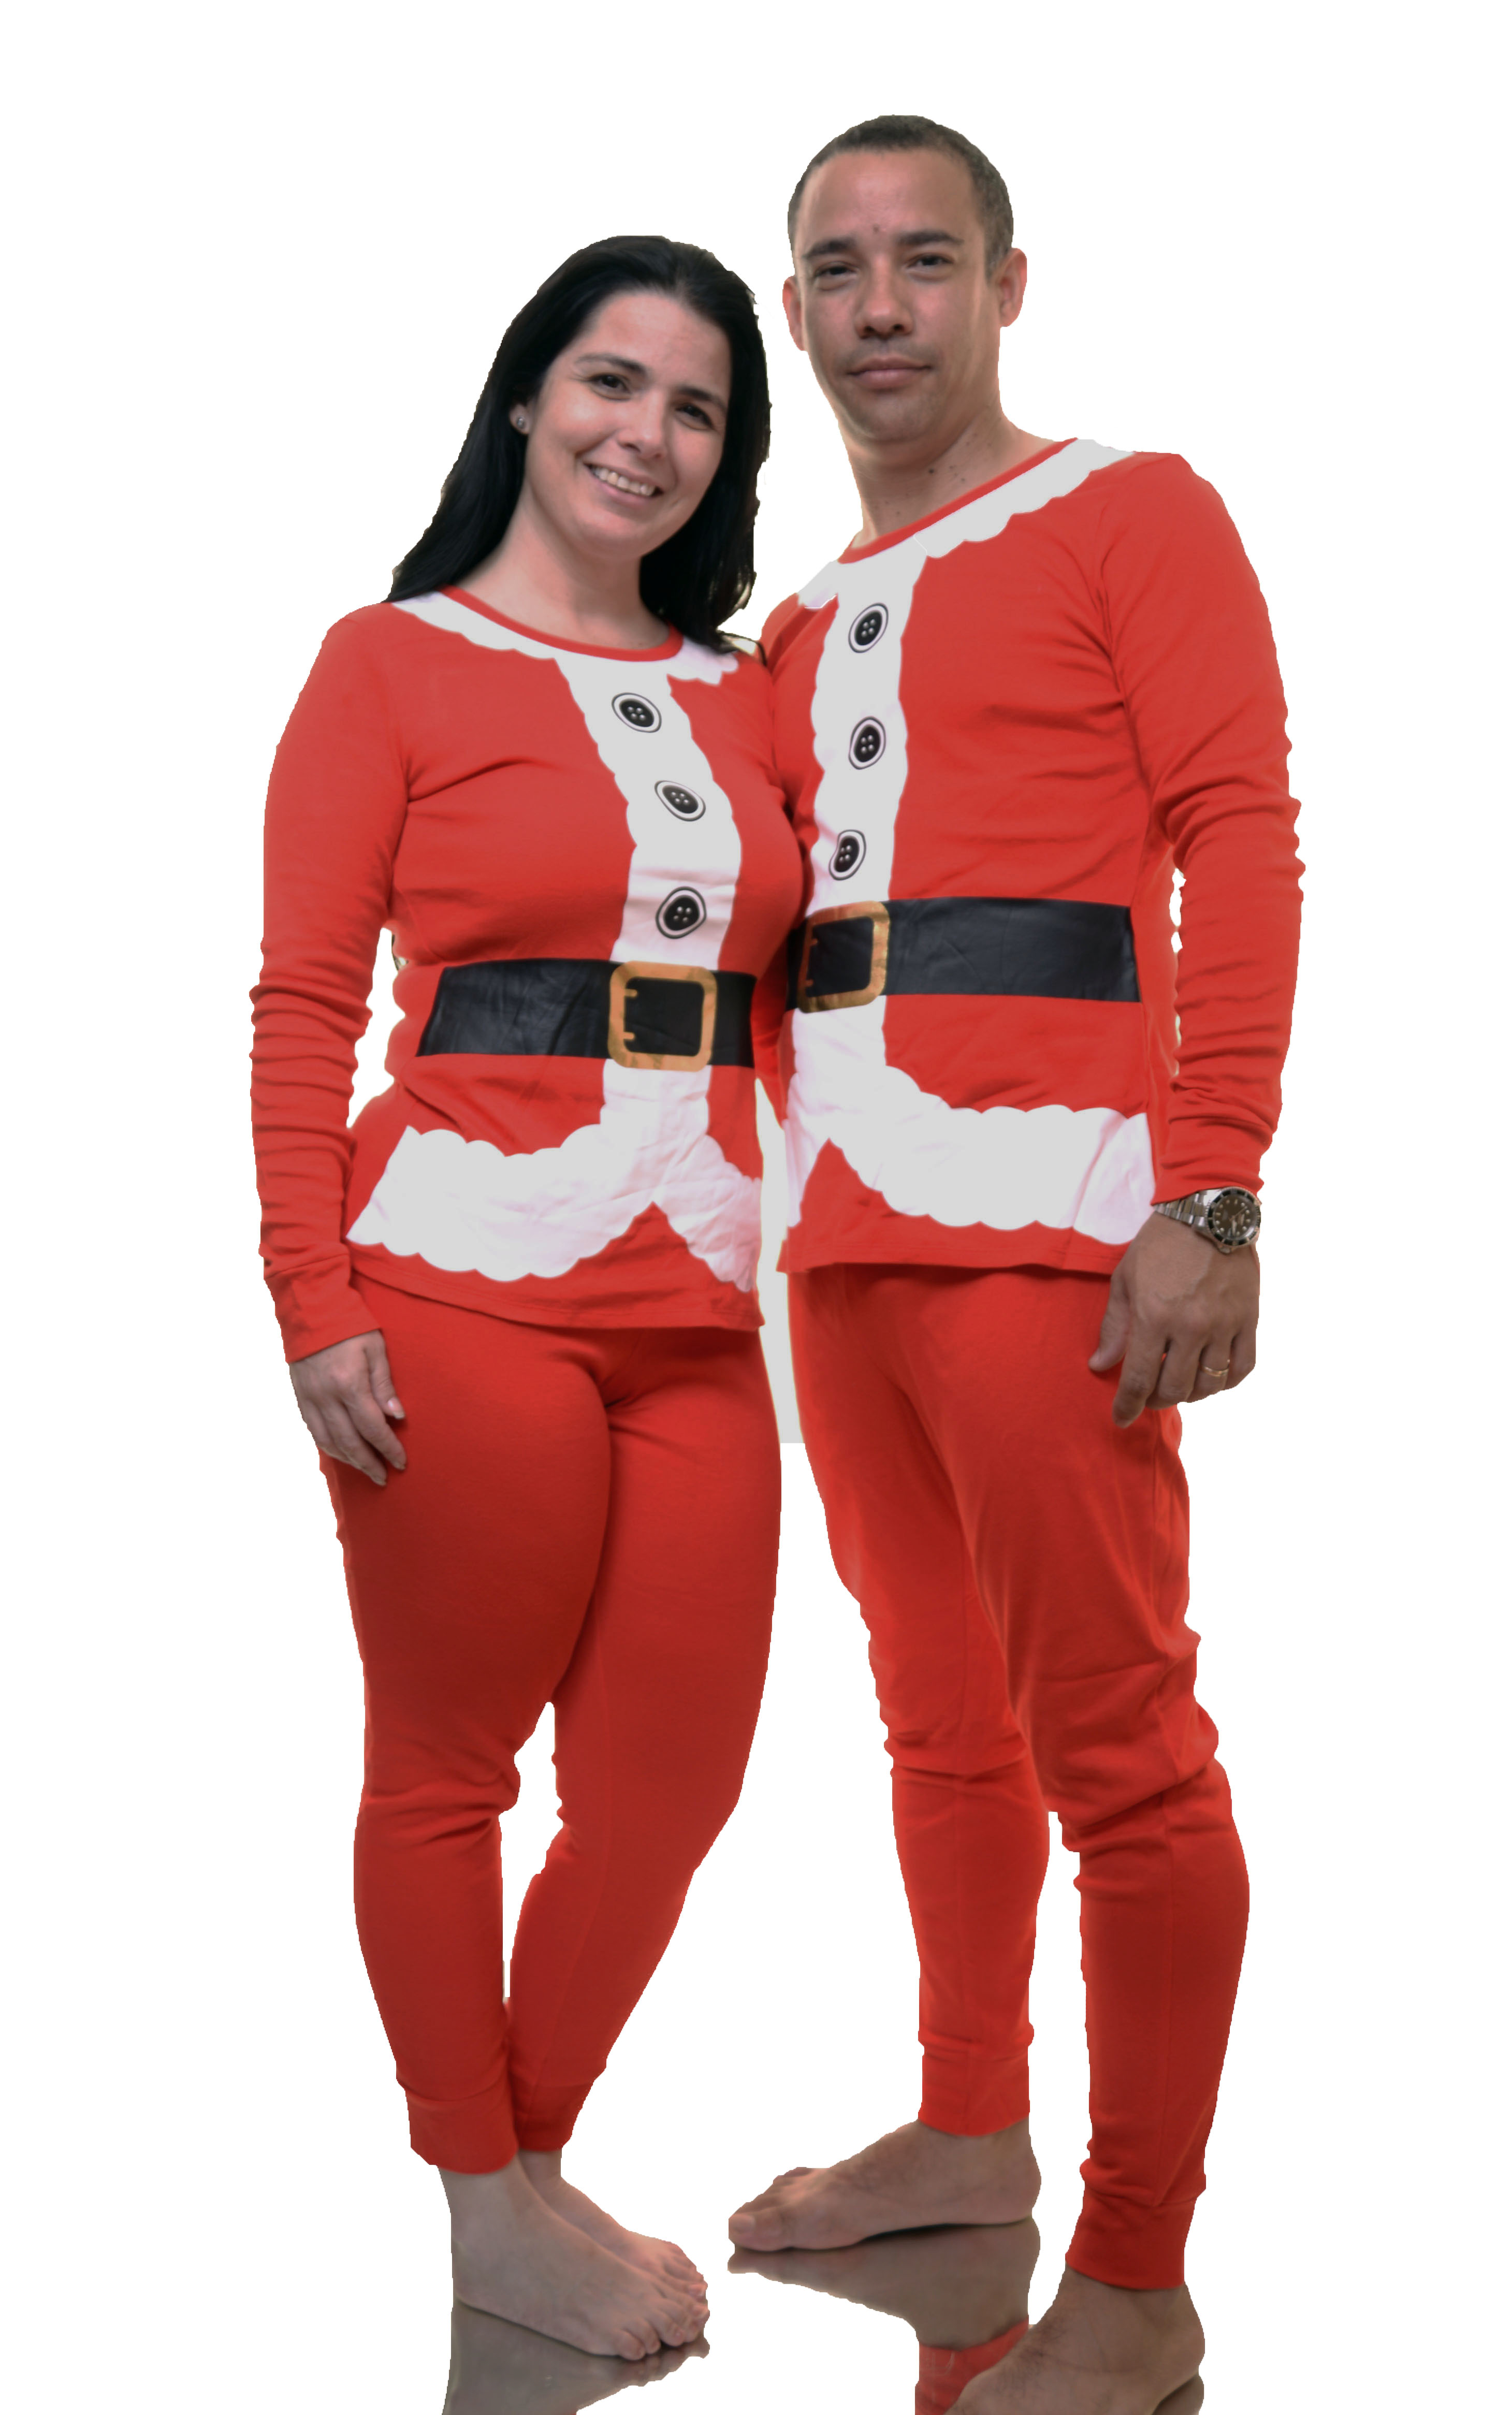 Target - Santa Claus Adult UNISEX Christmas Pajamas 2 Pieces Set Size L -  Walmart.com 1b00ed16f